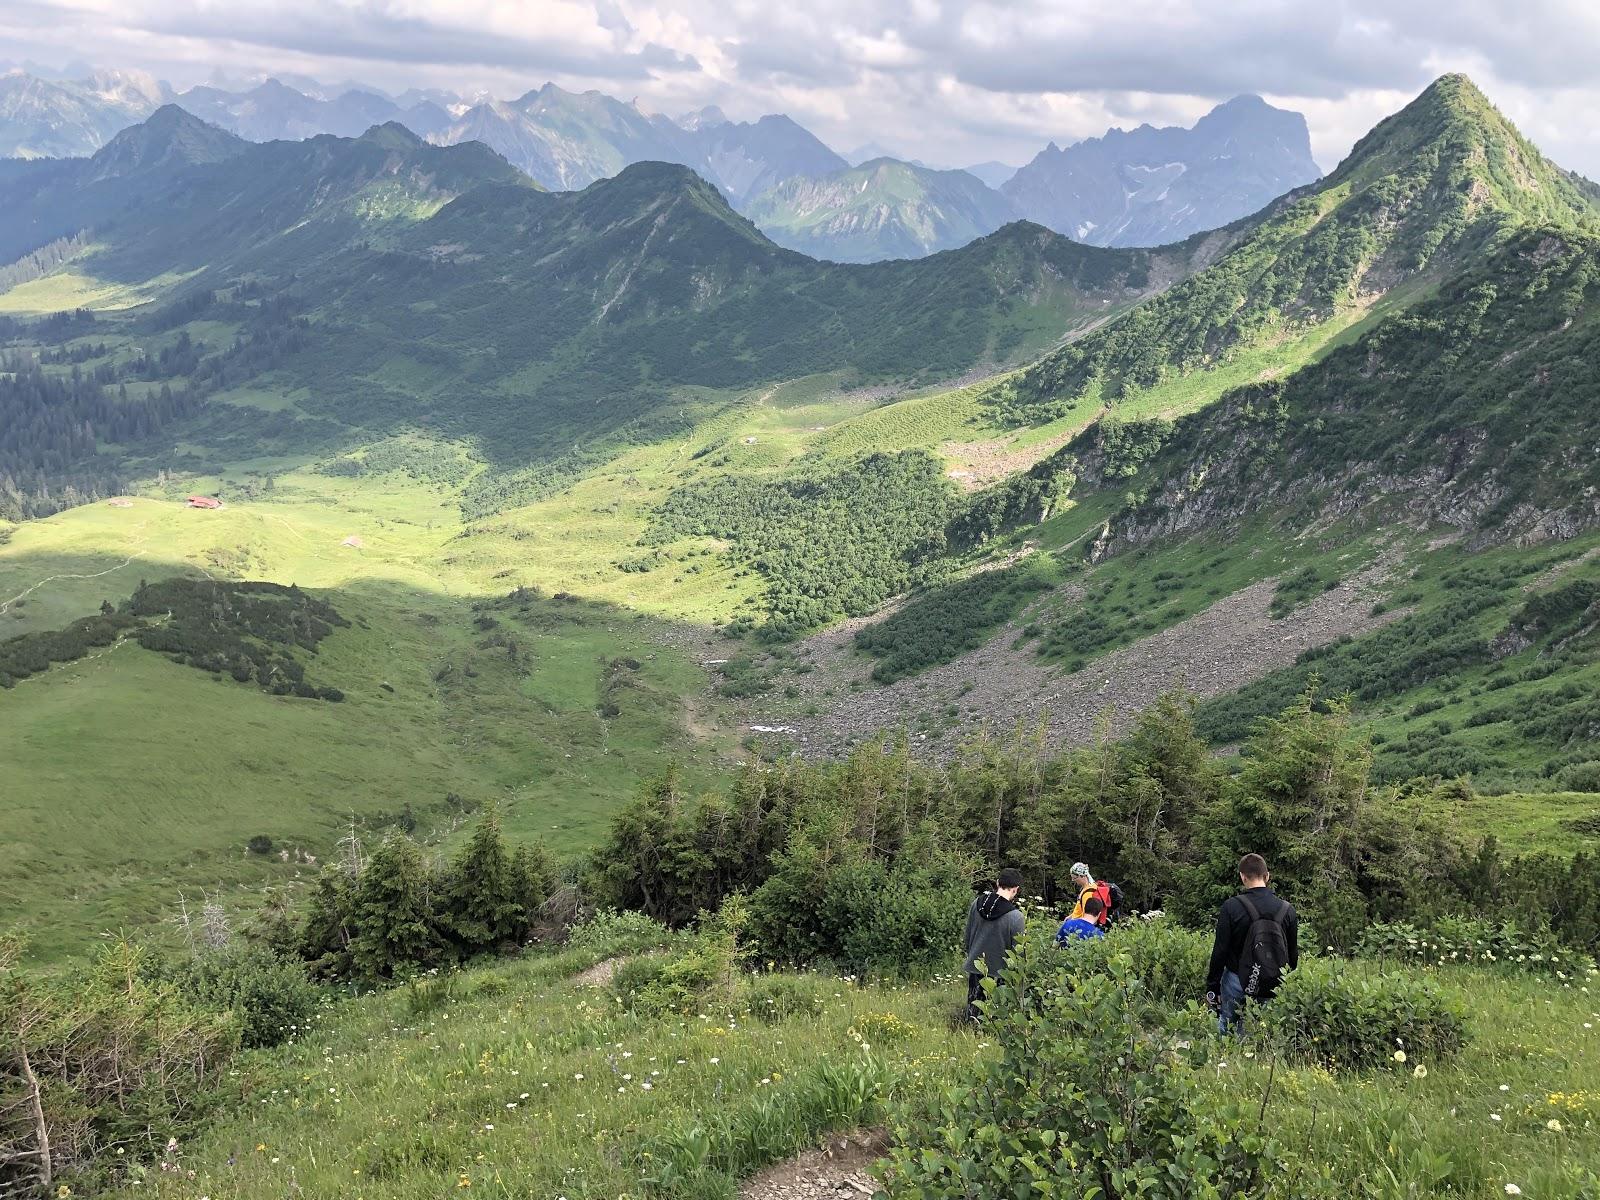 mycrm-team-in-den-bergen